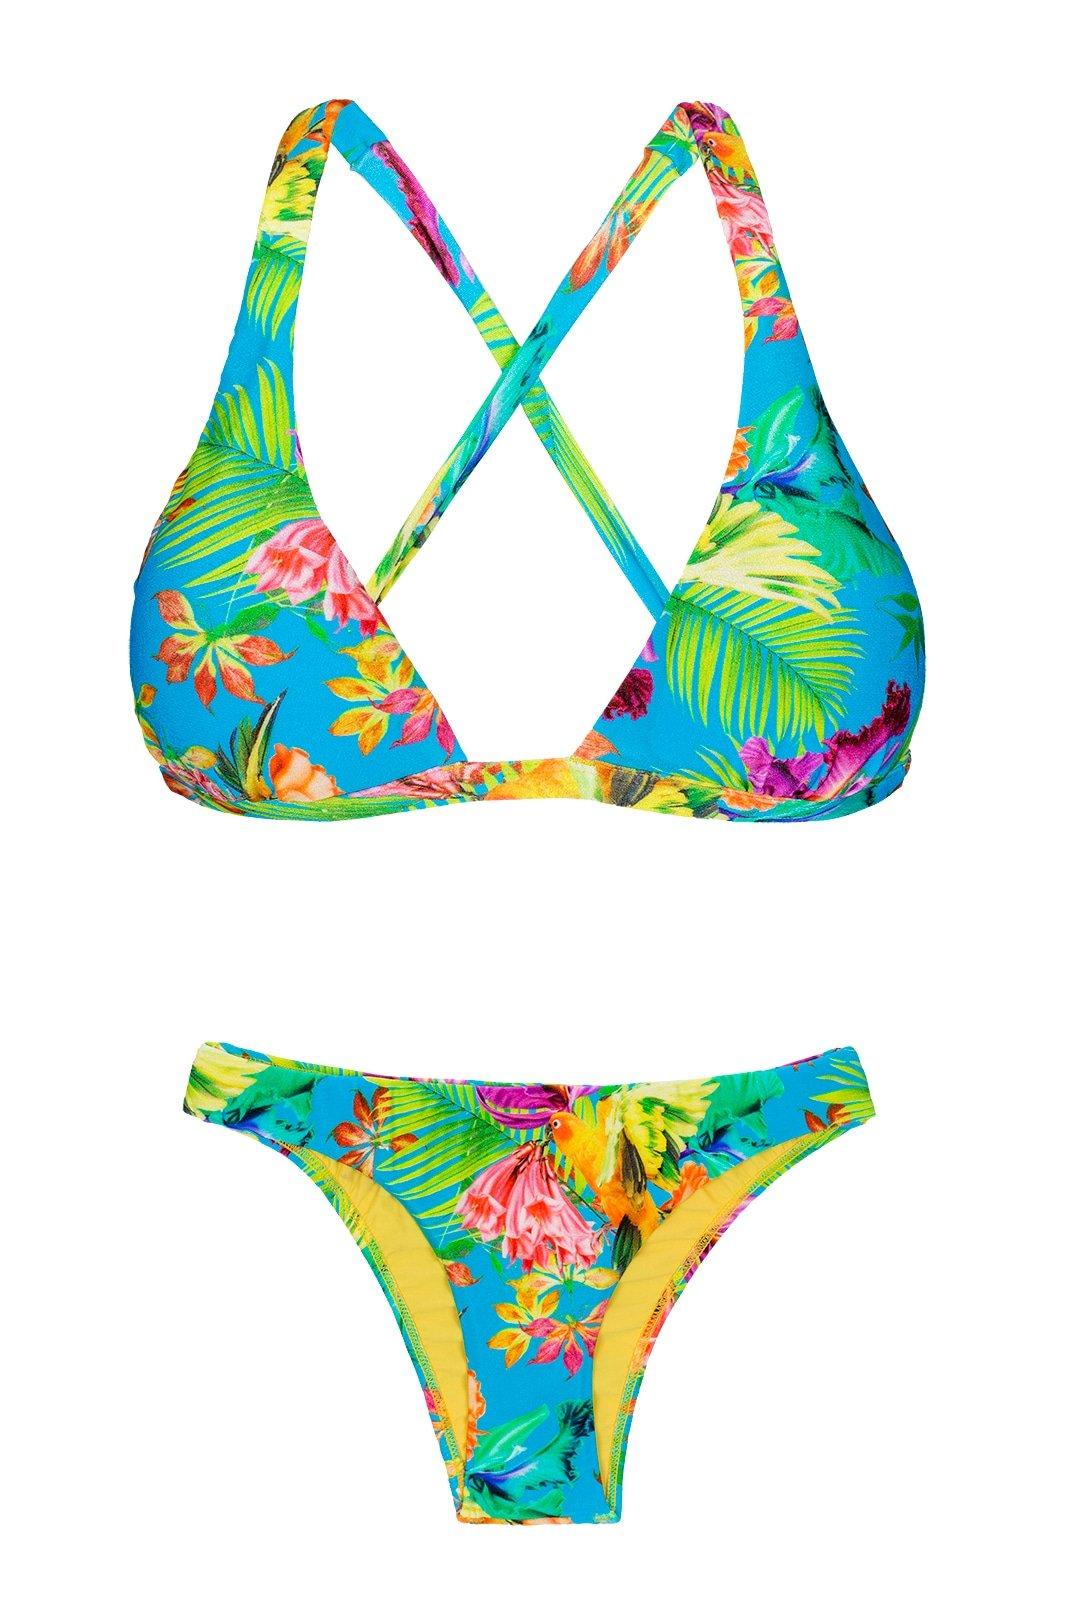 7c492bbc029 Tropical Floral Non-adjustable Halter Triangle Bikini - Tropical Blue  Cortinao - Rio de Sol